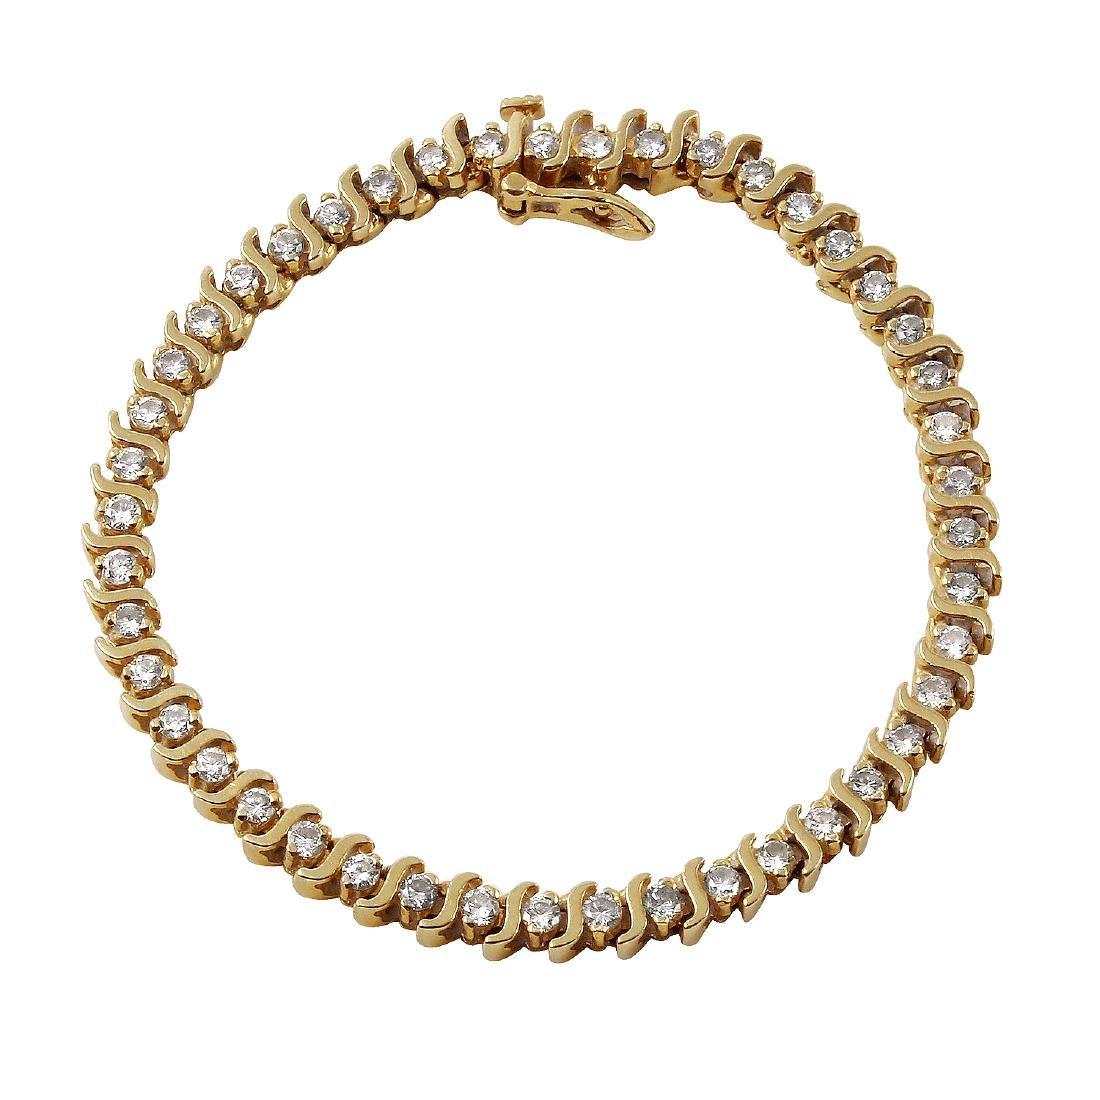 14KT Yellow Gold 1.51ctw Diamond Tennis Bracelet Length